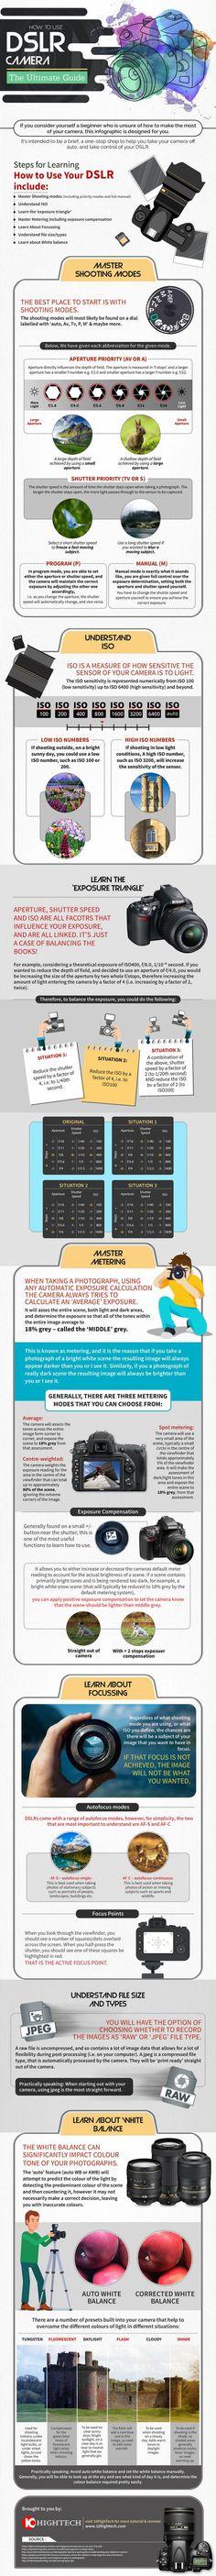 DSLR/Manual Photography Cheat Sheet